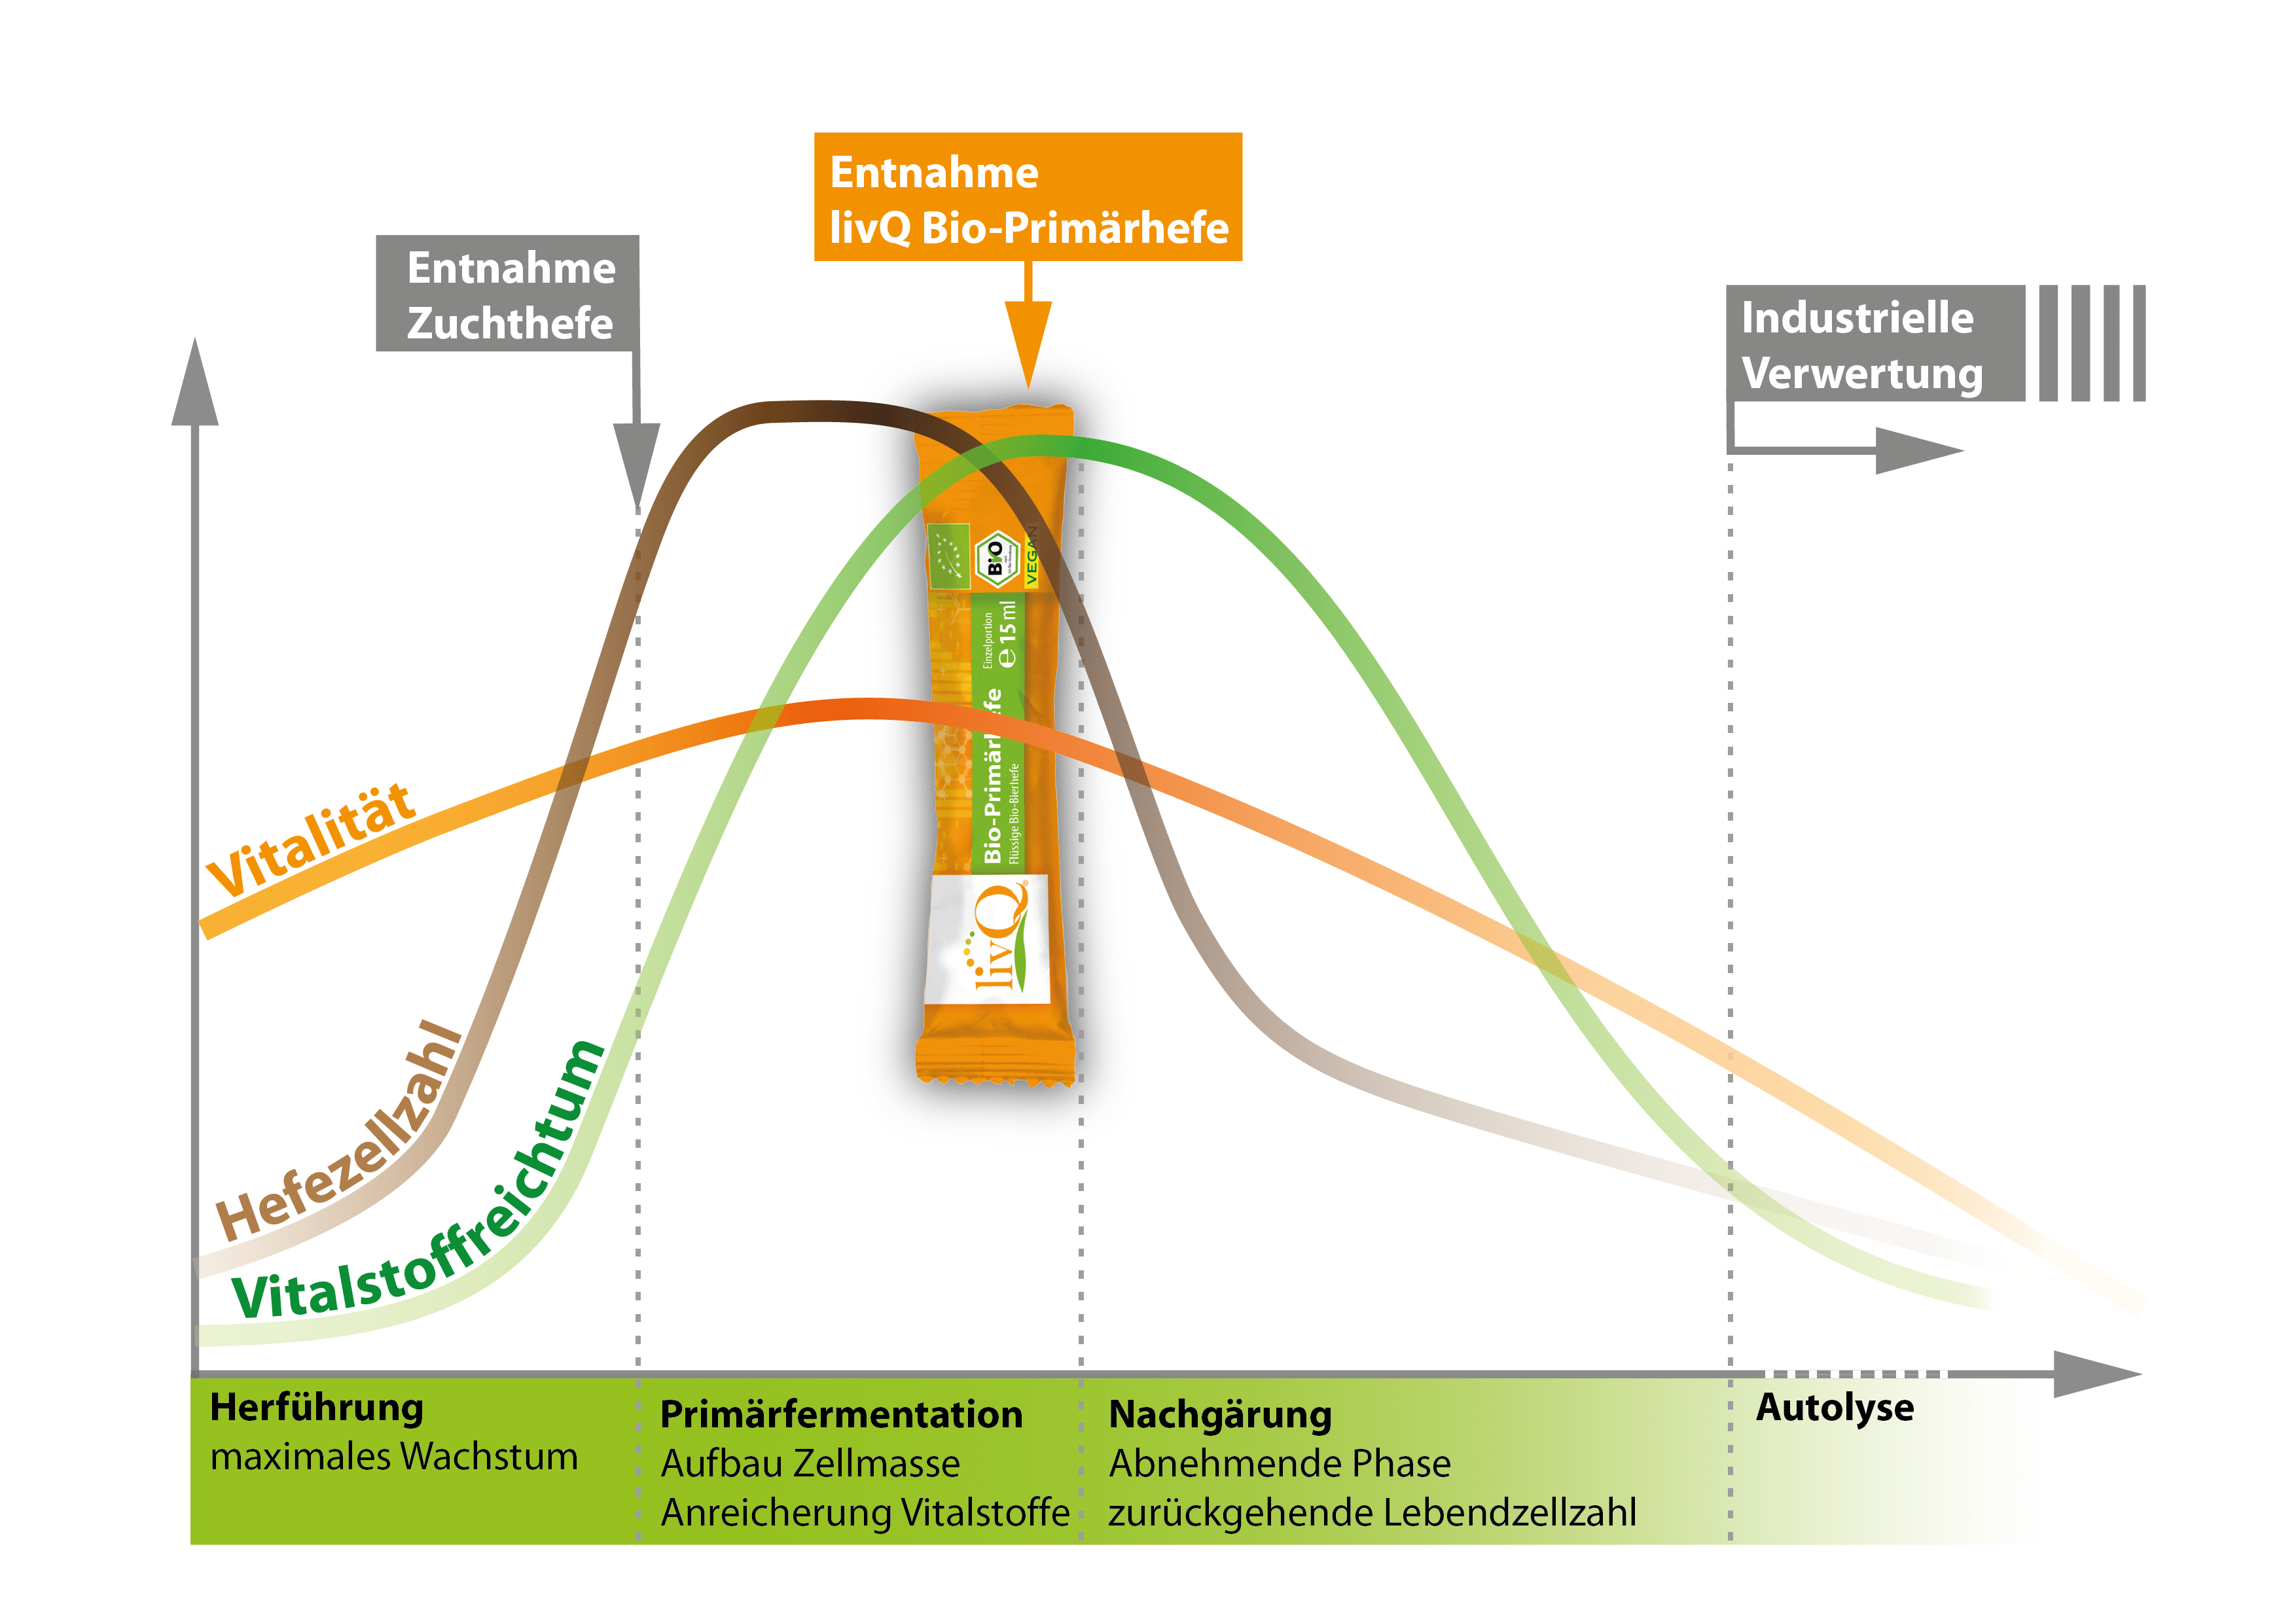 Bio-Primärhefe Lebenszyklus